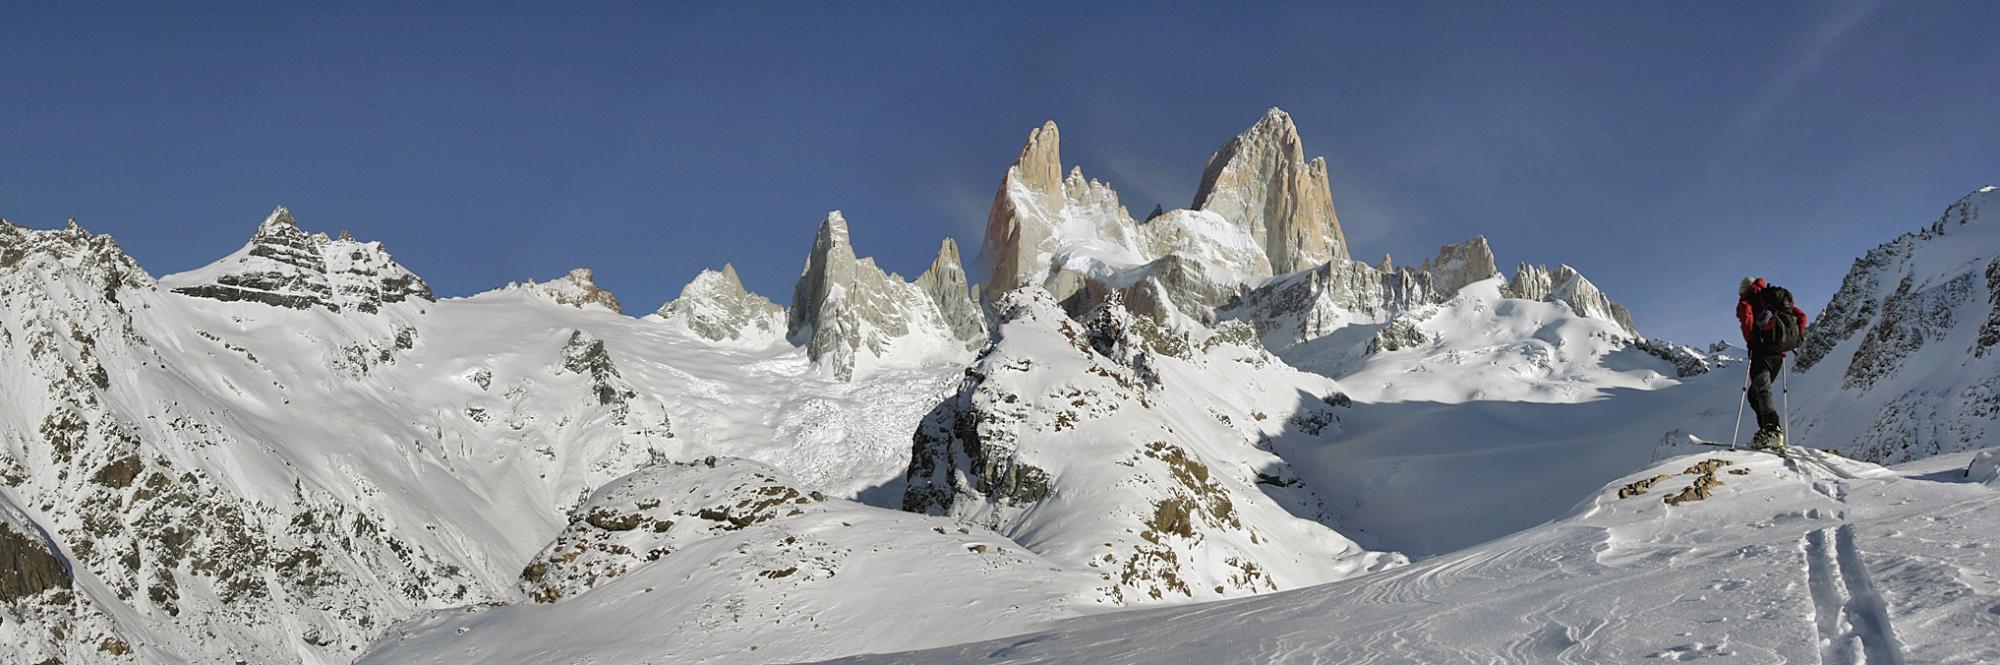 skitouring-patagonia-chalten